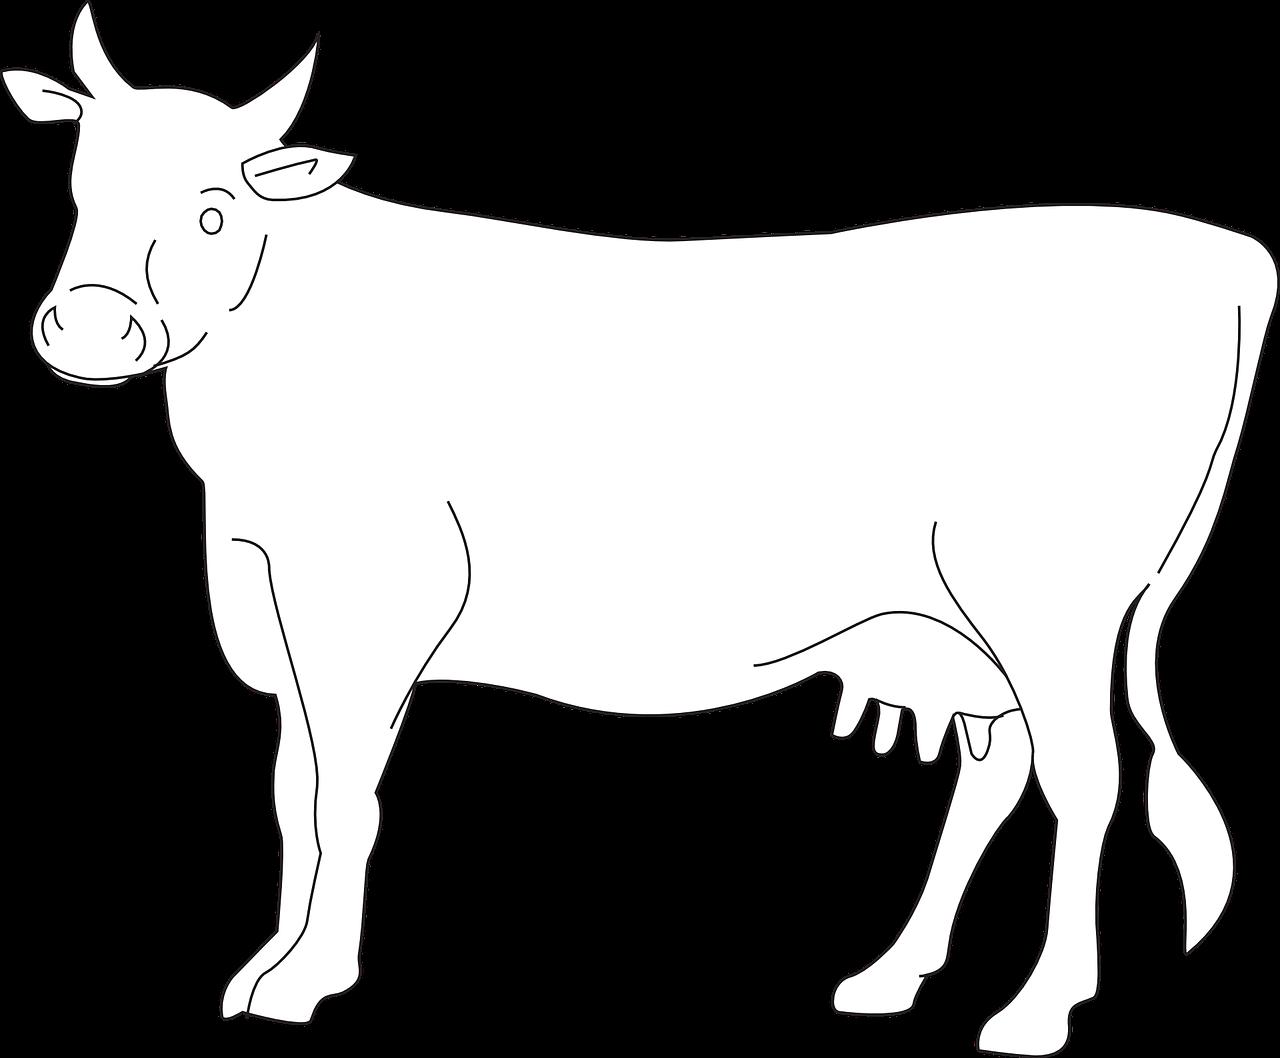 Cow cattle farm transparent. Farmers clipart livestock farming